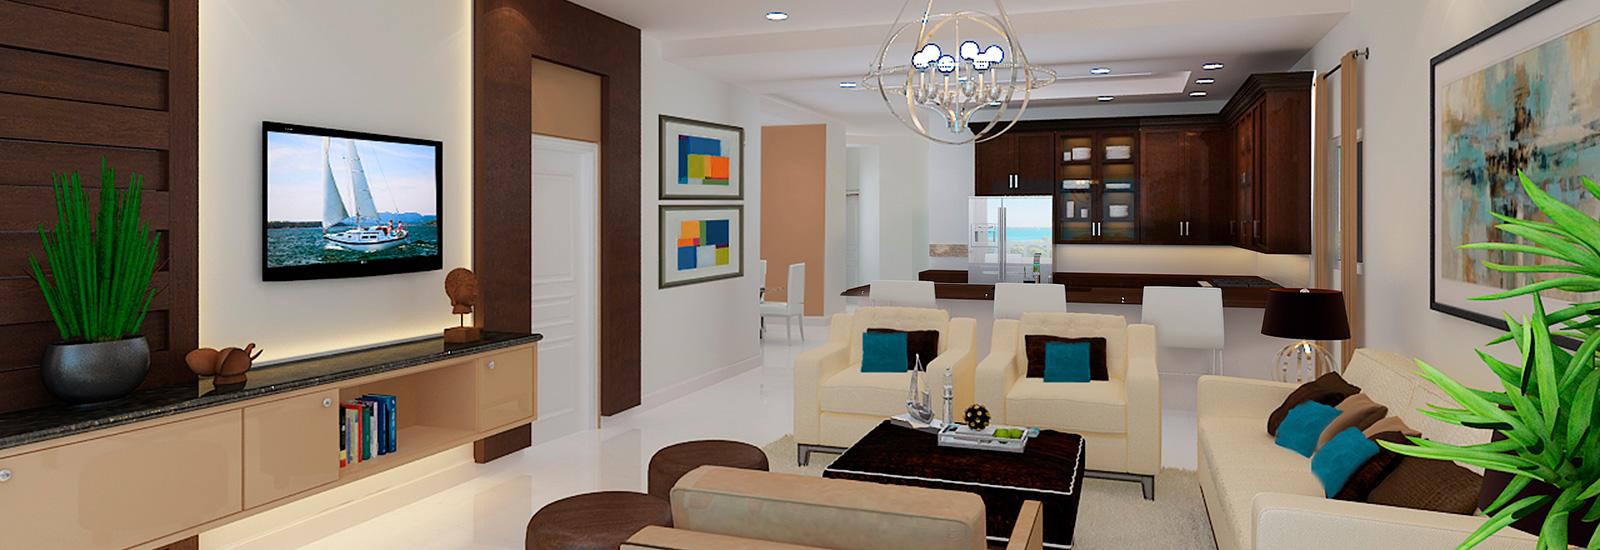 1600x550-EdgewaterHB-greatroom.jpg